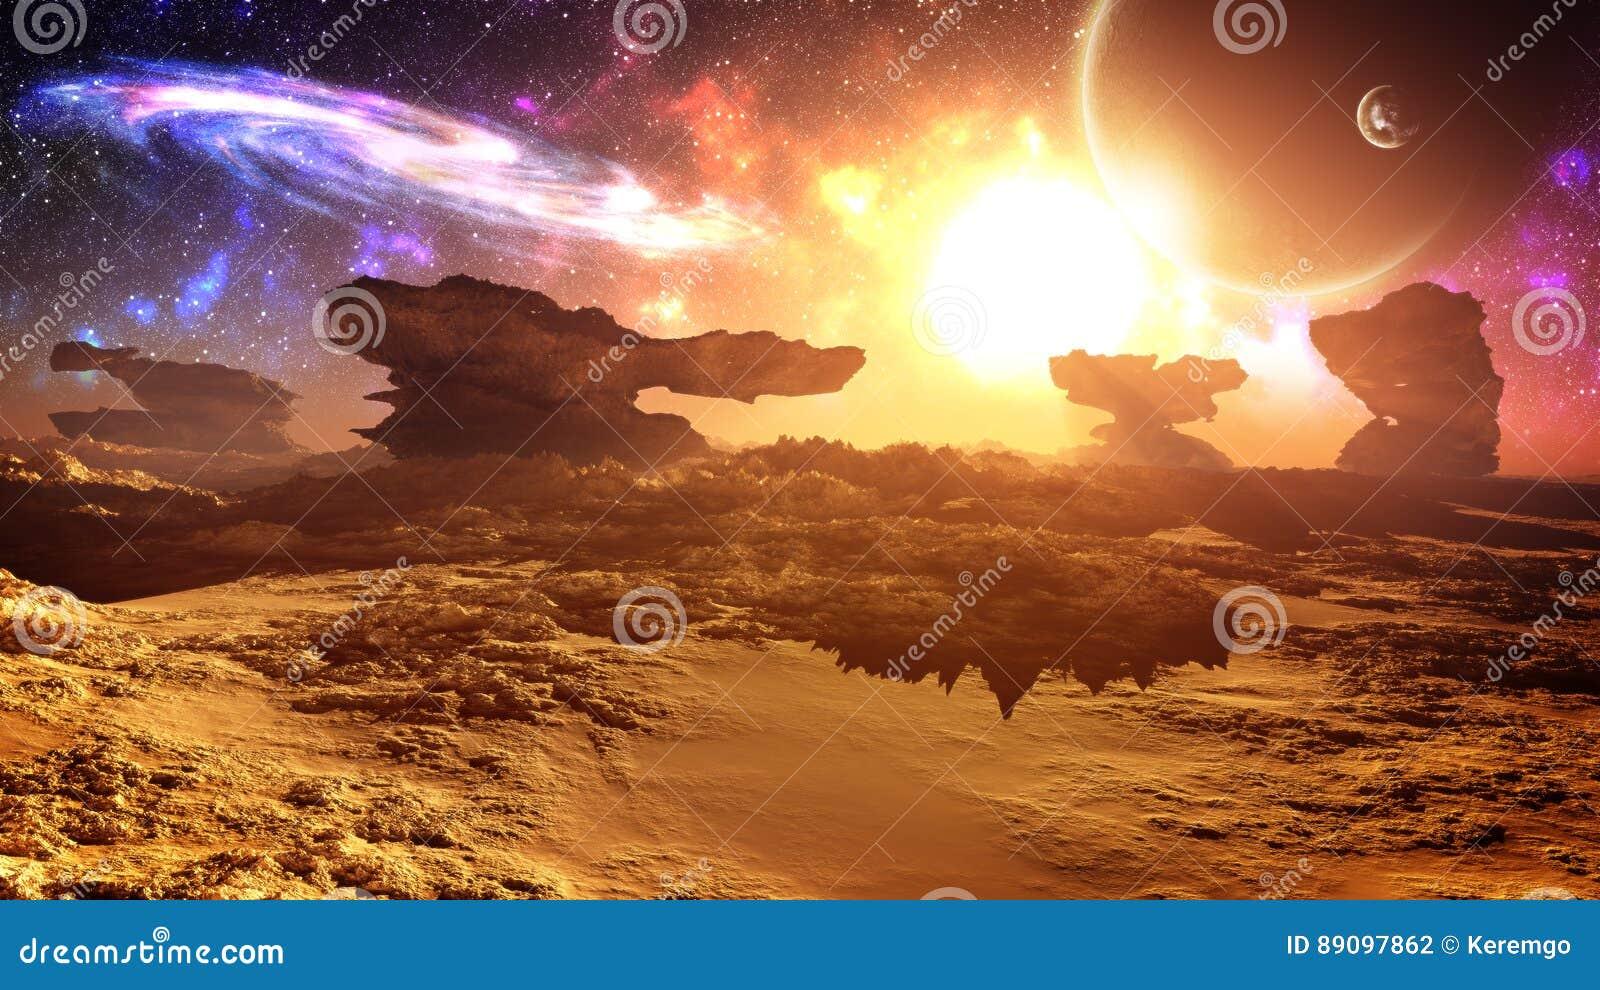 Puesta del sol extranjera gloriosa épica del planeta con la galaxia